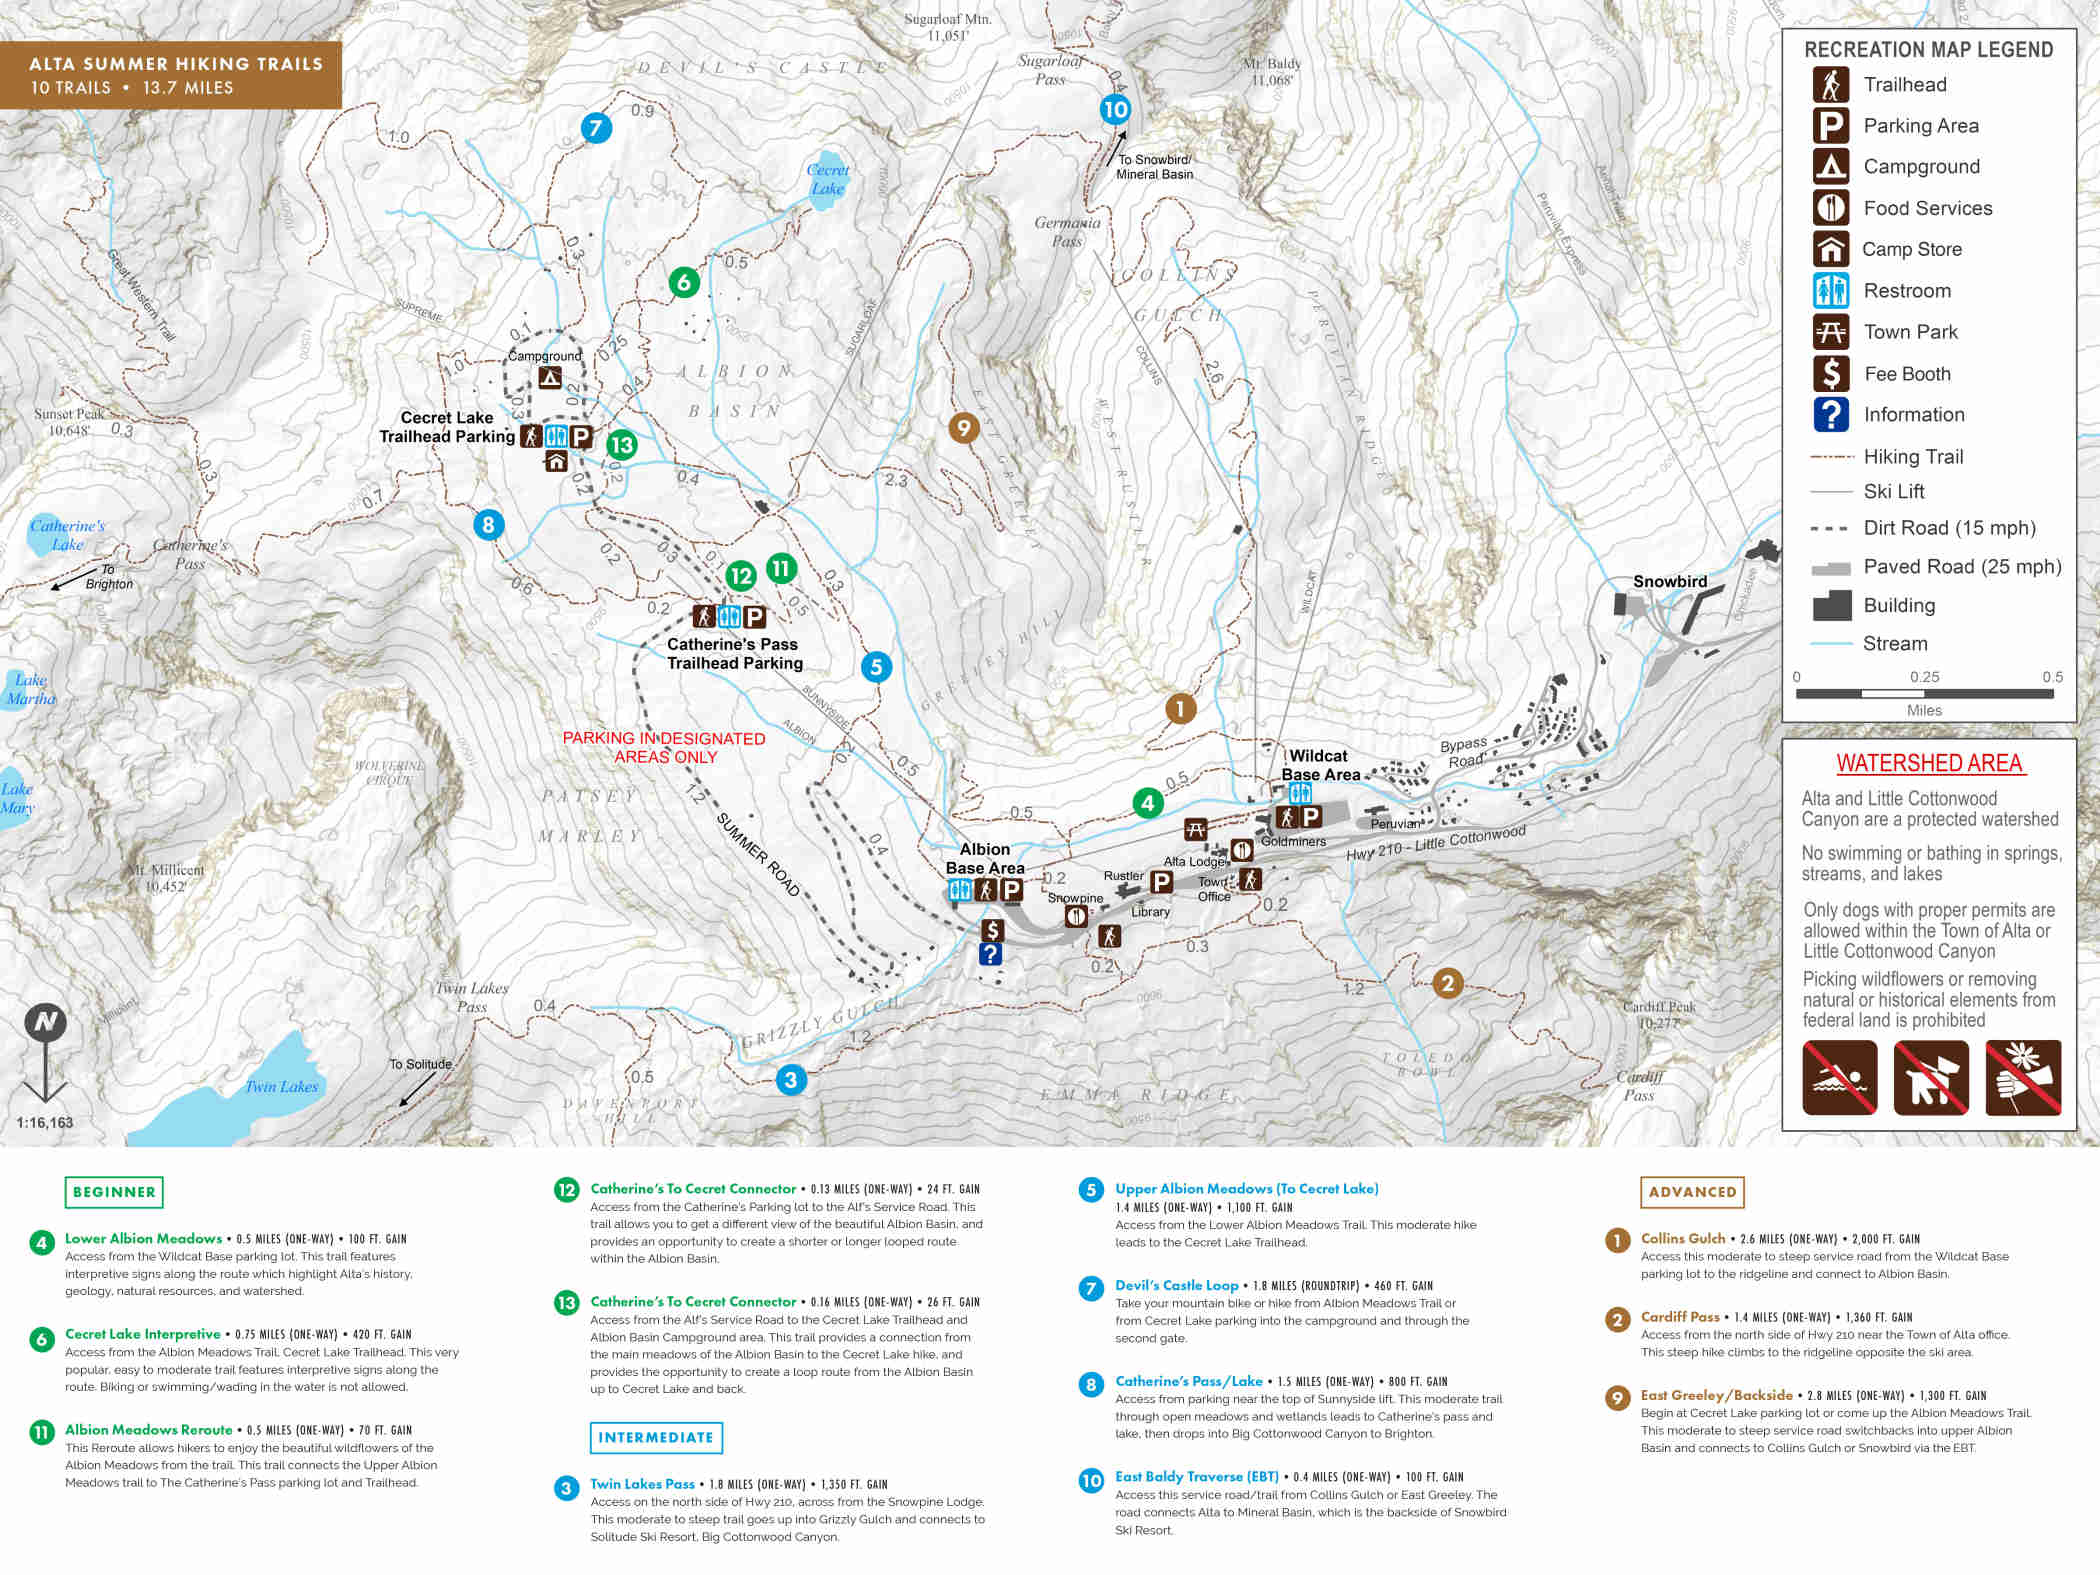 Alta Summer Trail Map - August 2021